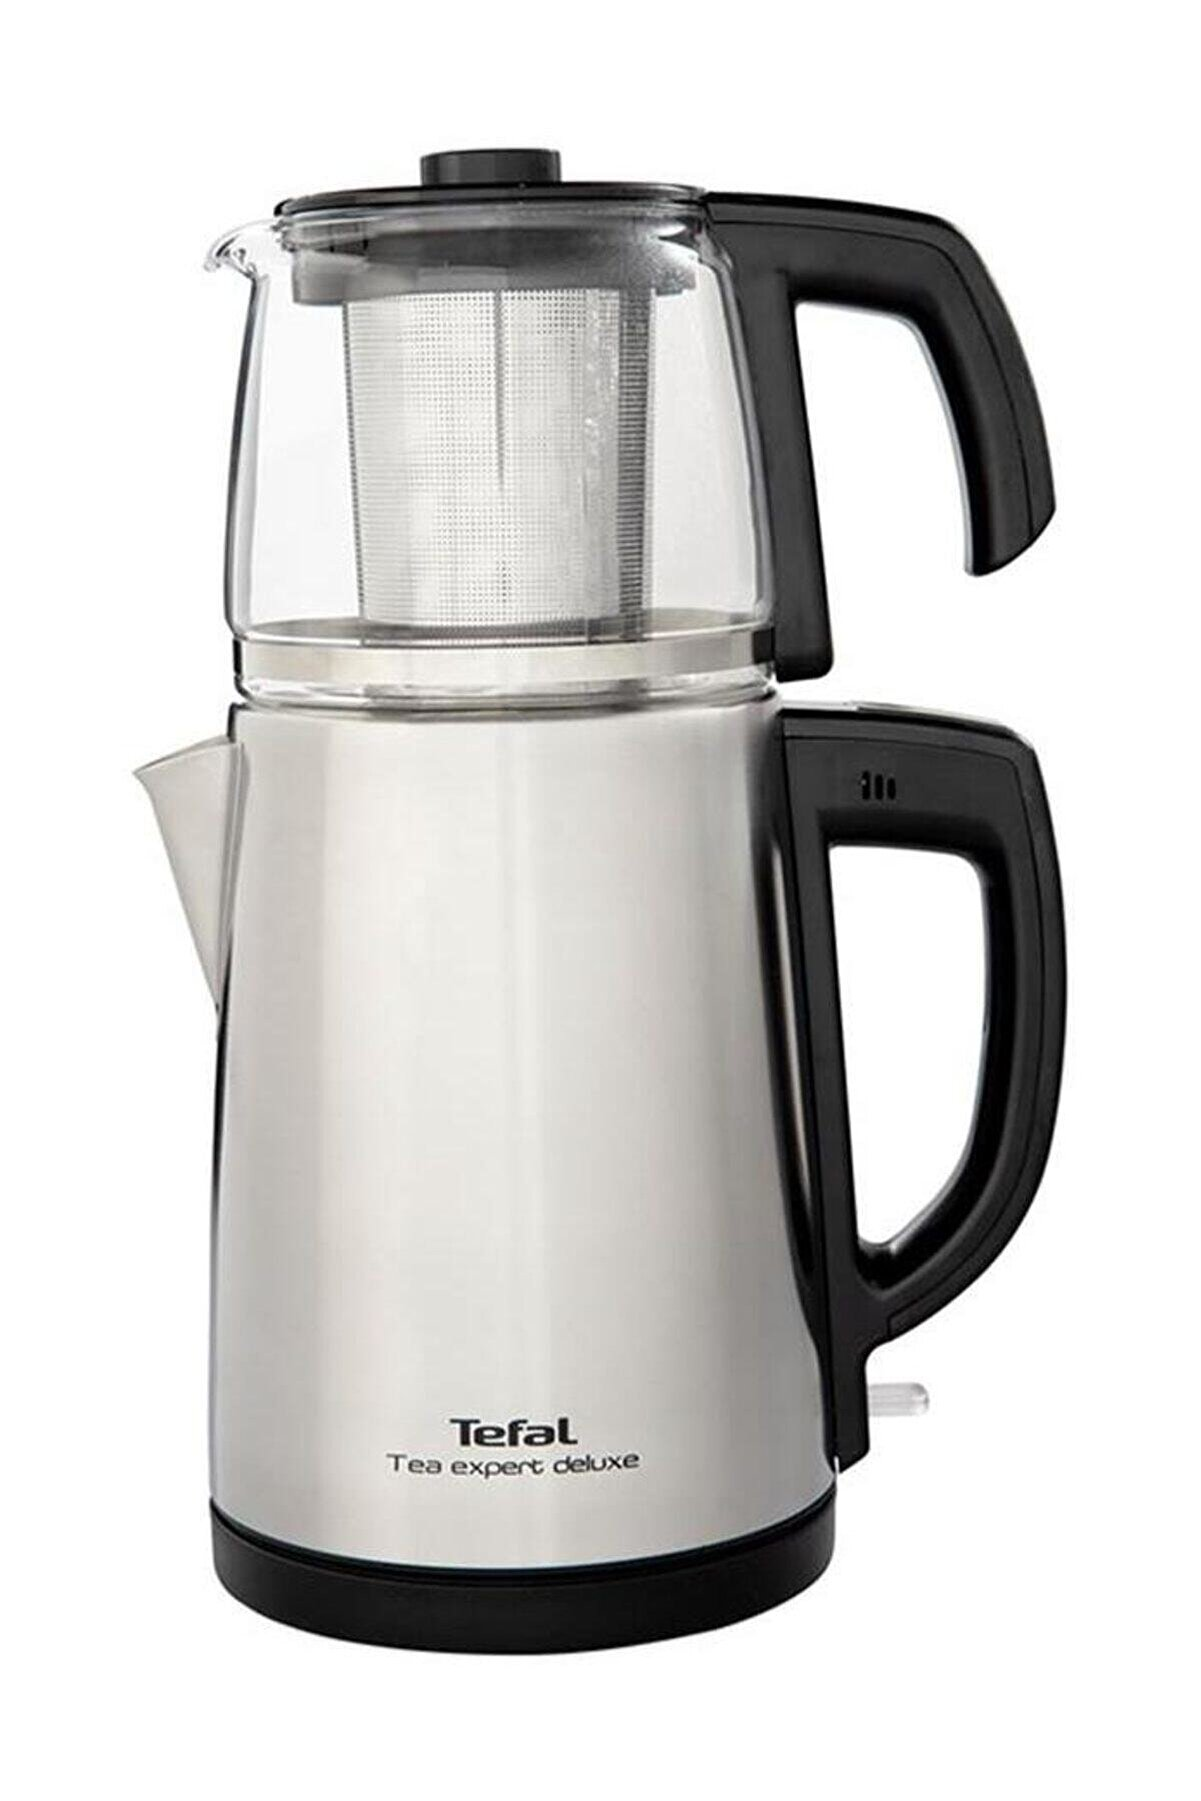 TEFAL Tea Expert Deluxe Cam Demlikli Çay Makinesi